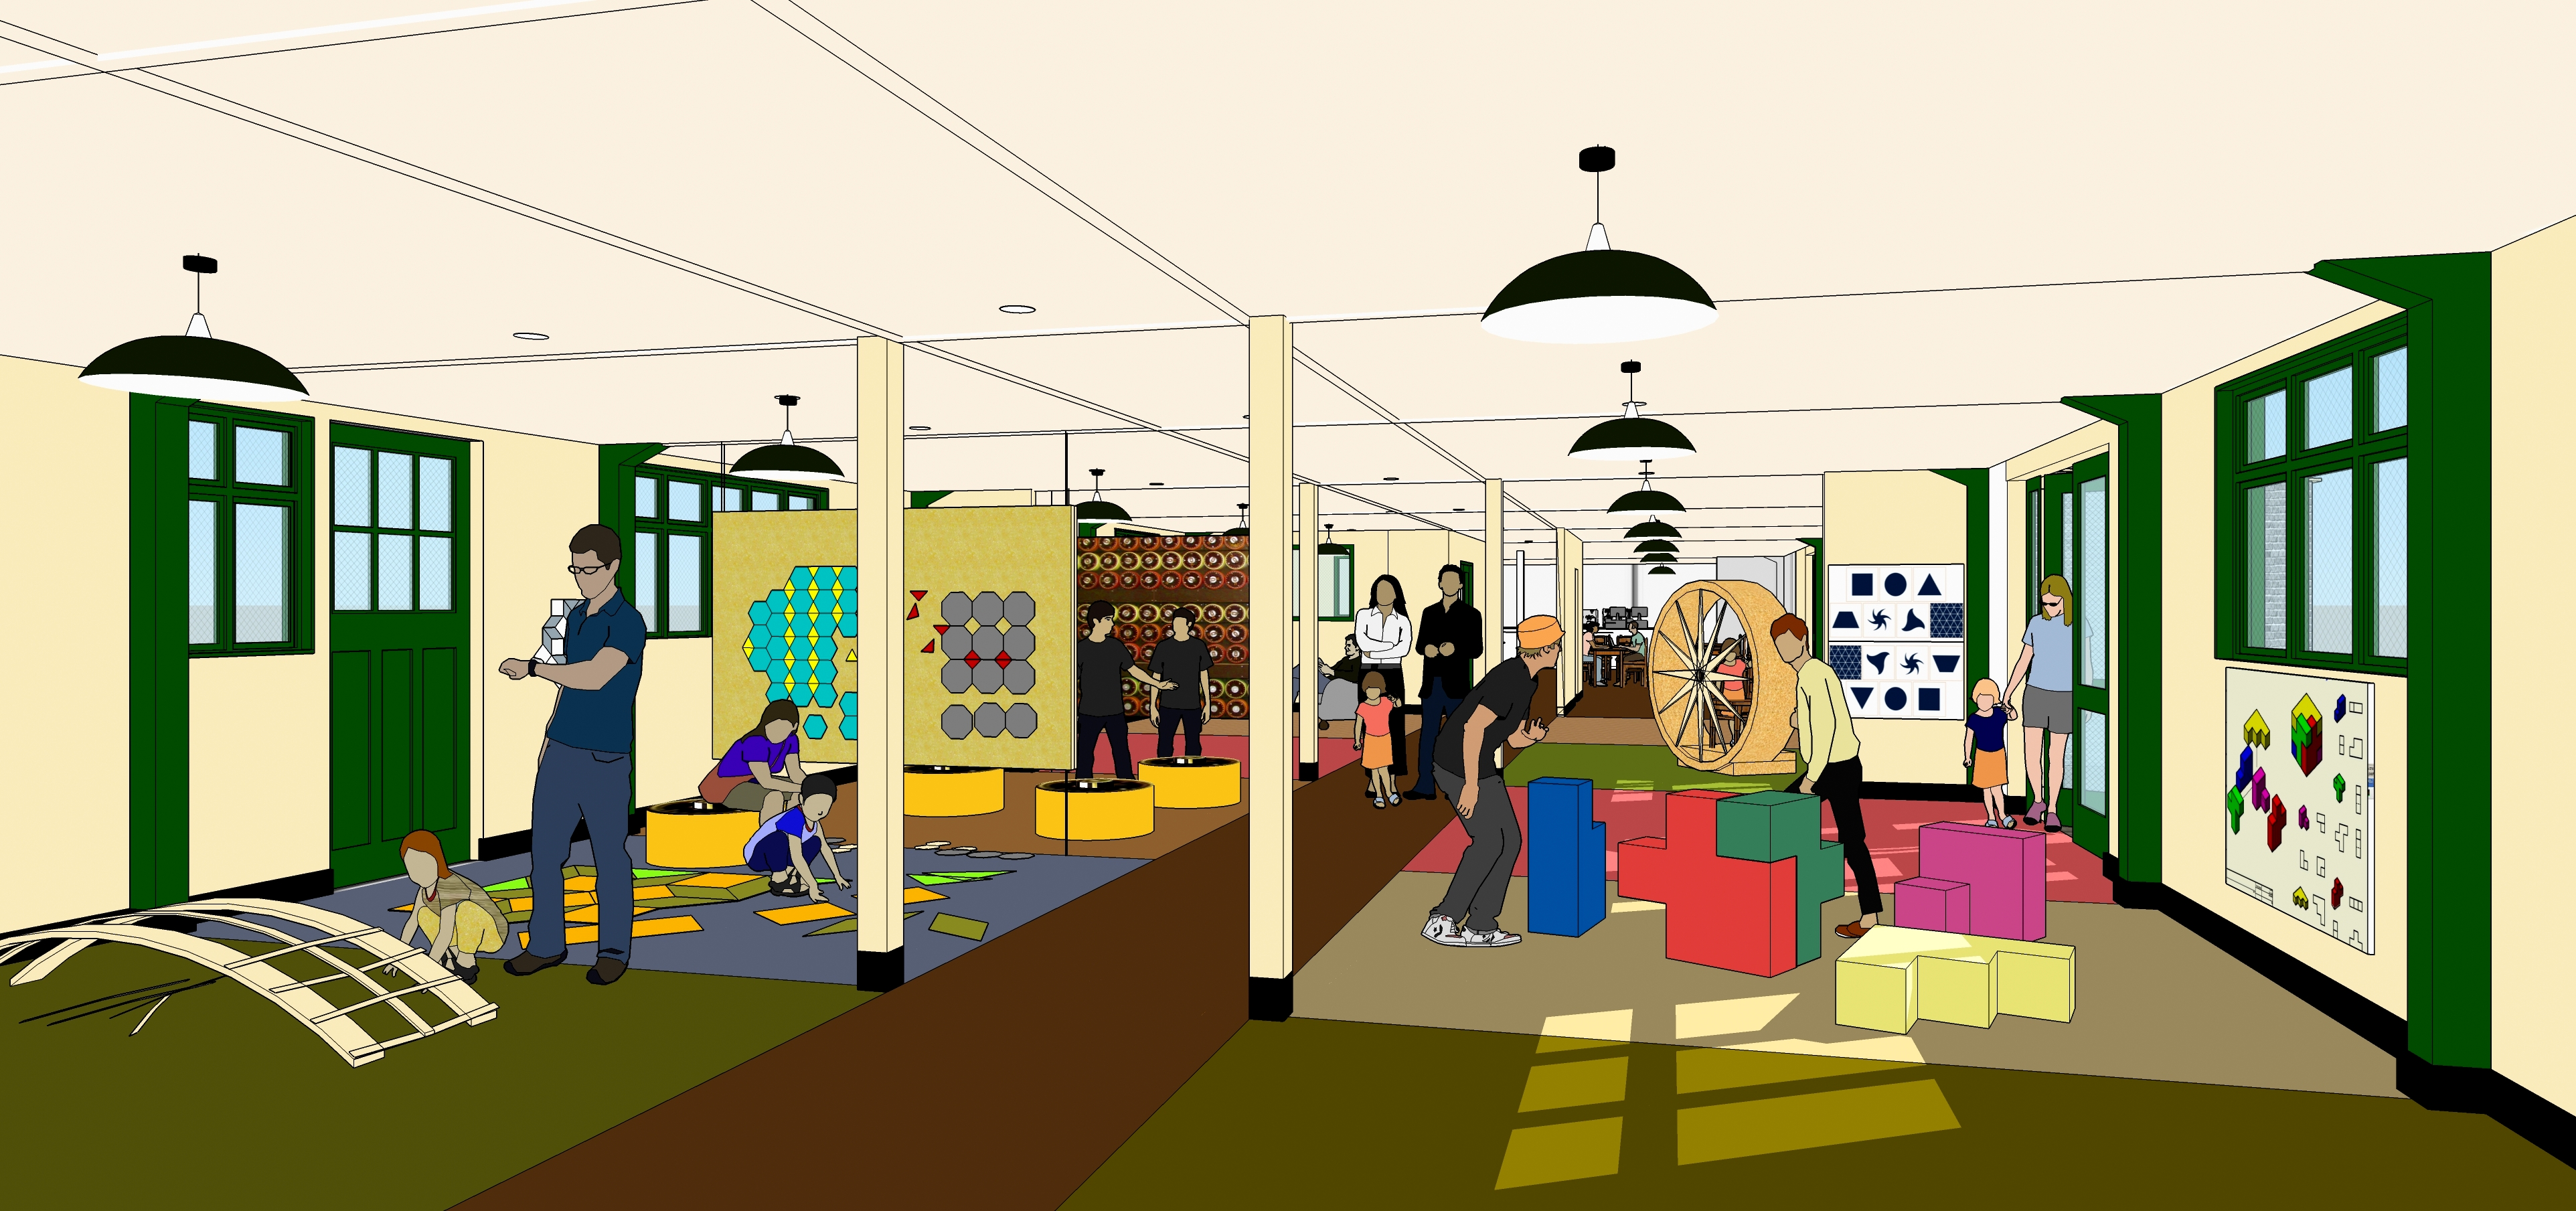 Hut 4 Interior